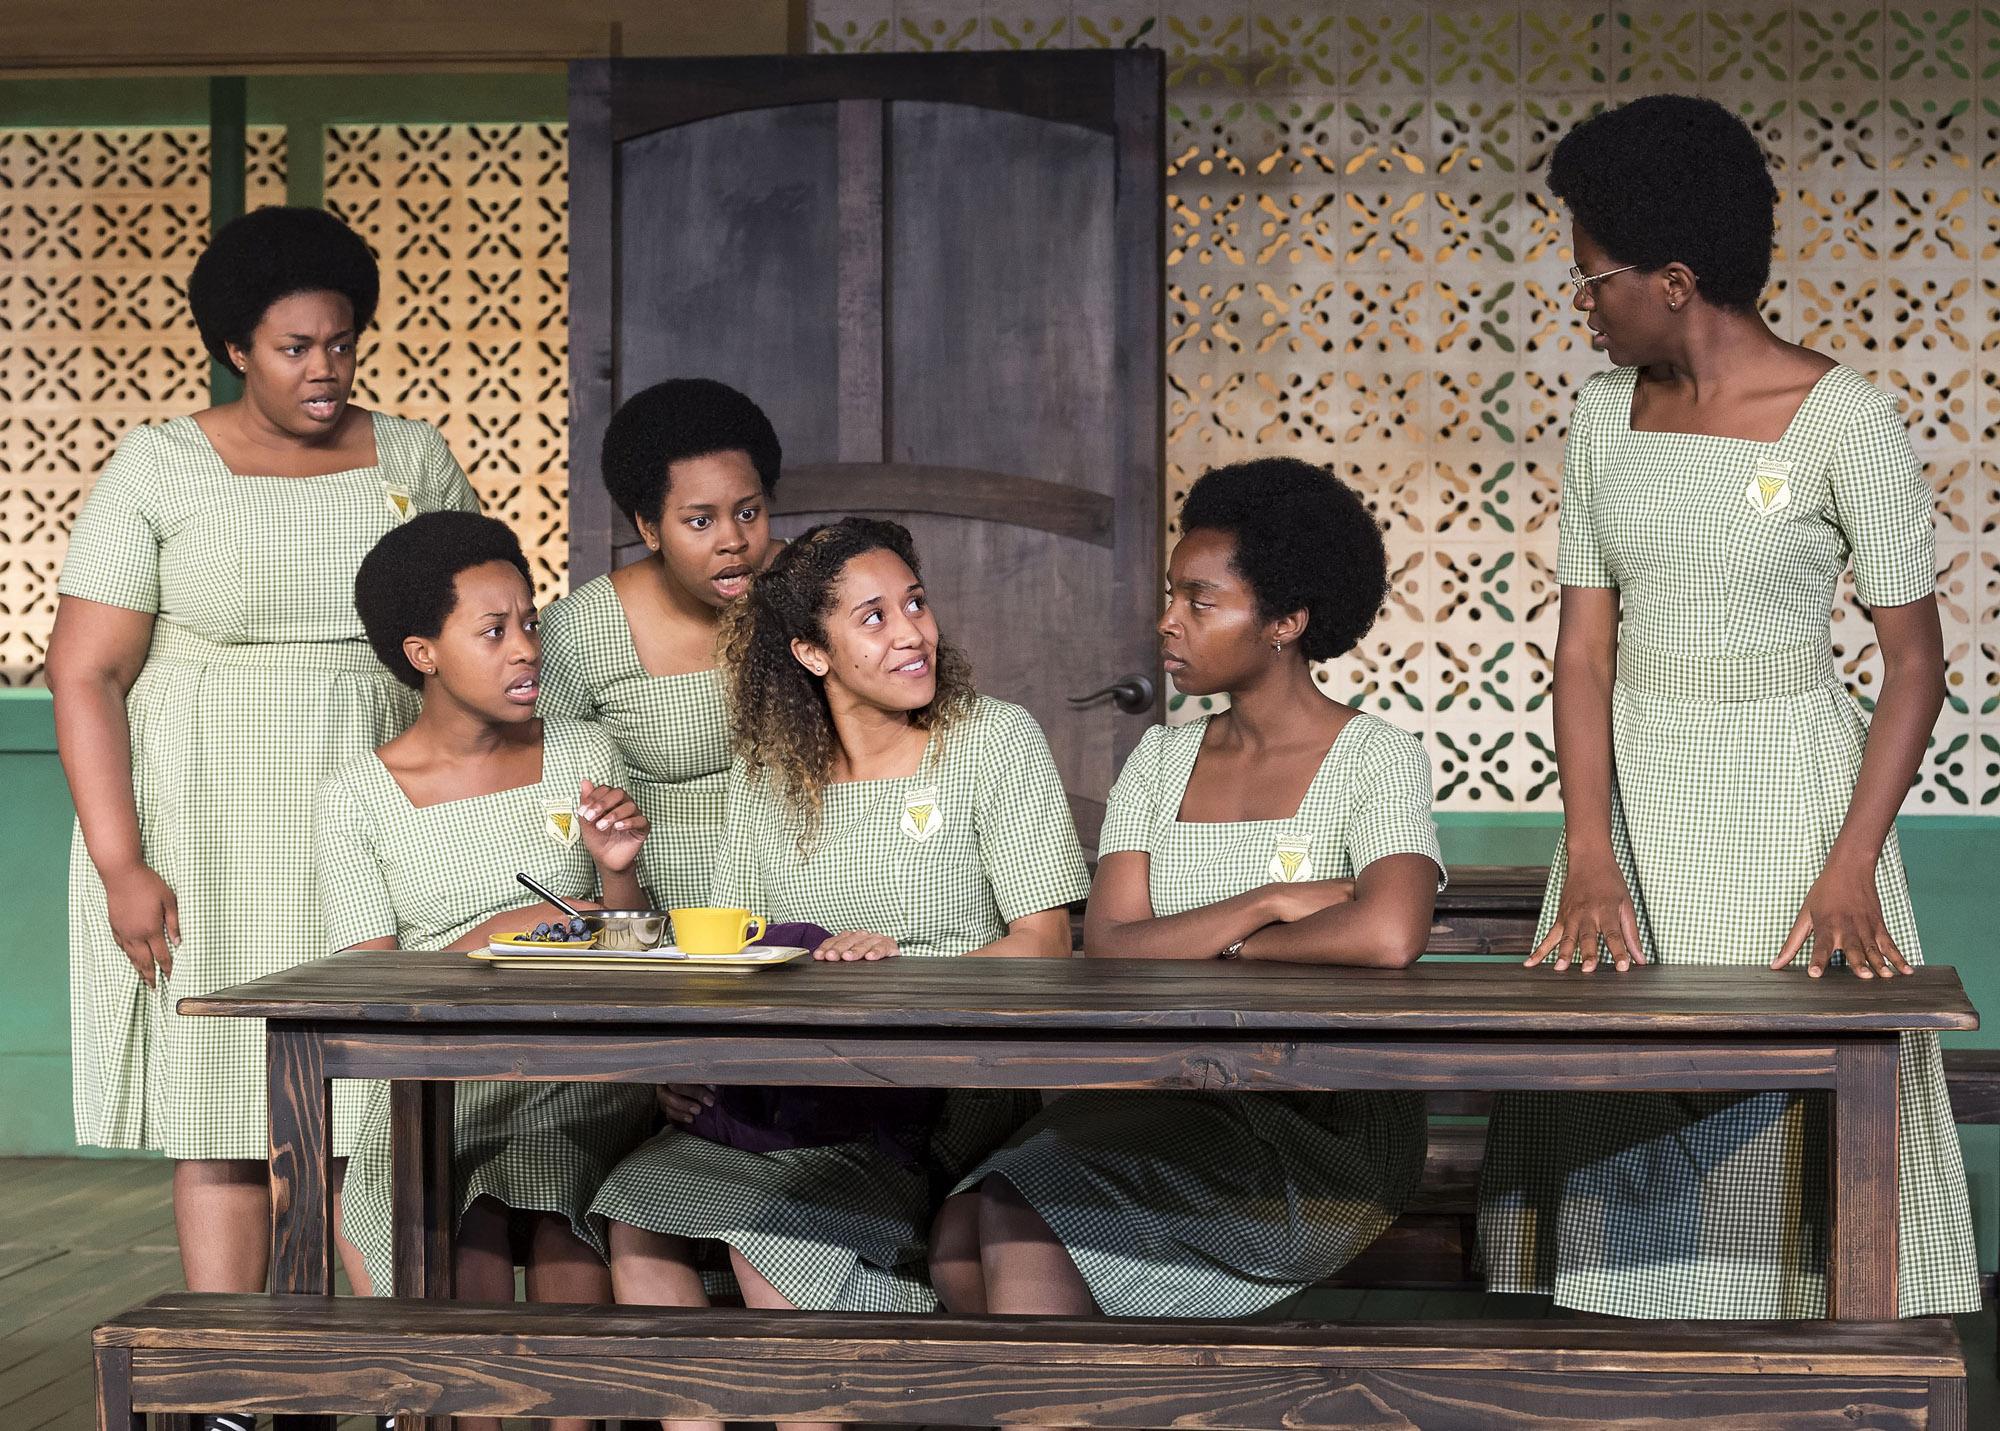 Abena Mensah-Bonsu, Mirirai Sithole, Paige Gilbert, Joanna A. Jones, MaameYaa Boafo, and Latoya Edwards. Photo Credit: Craig Schwartz.